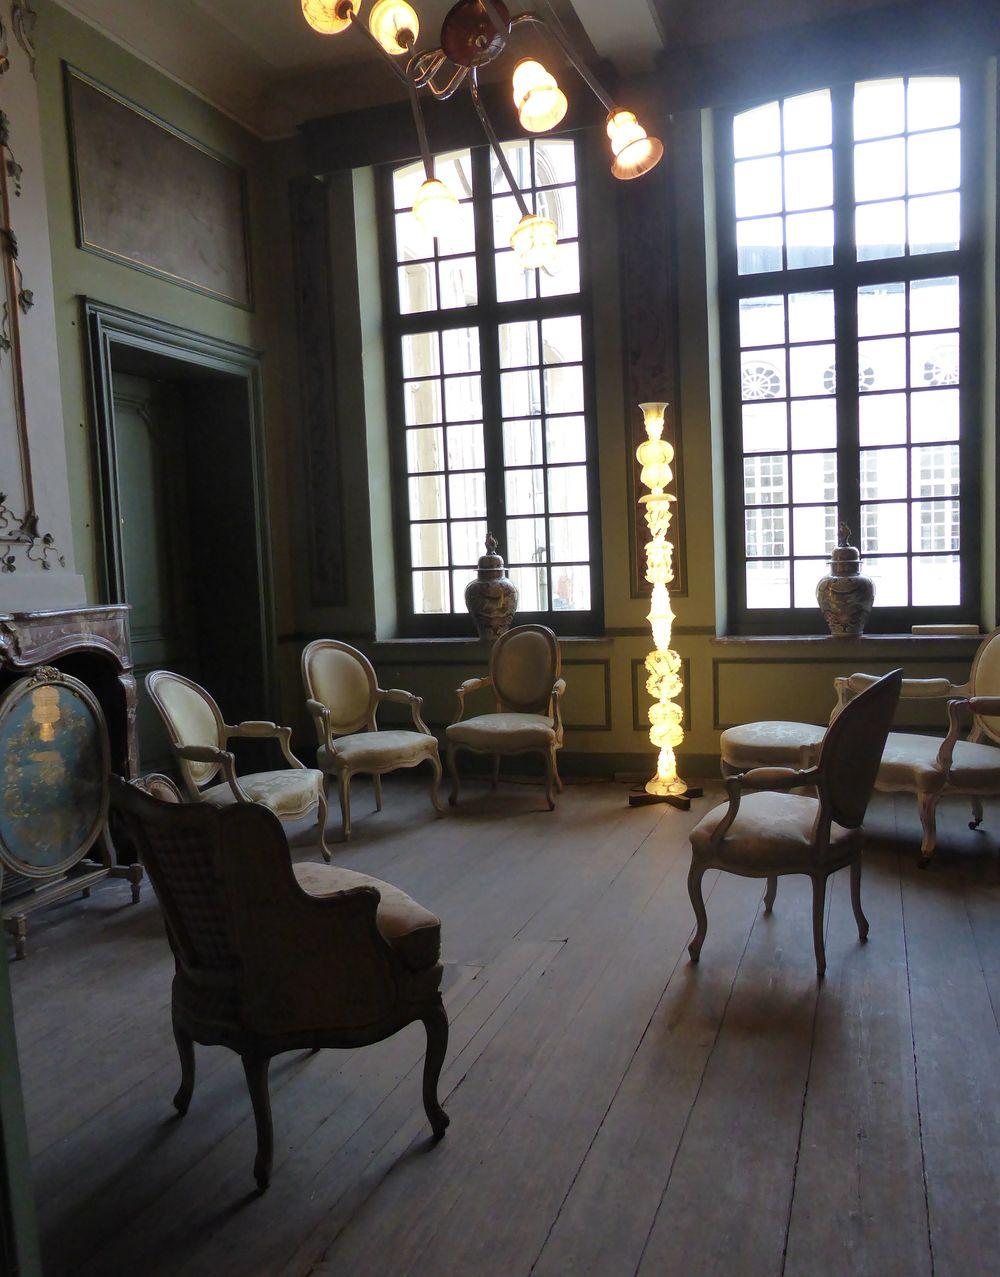 Lampes de  Patrick Reuvis , Design Museum, Gand